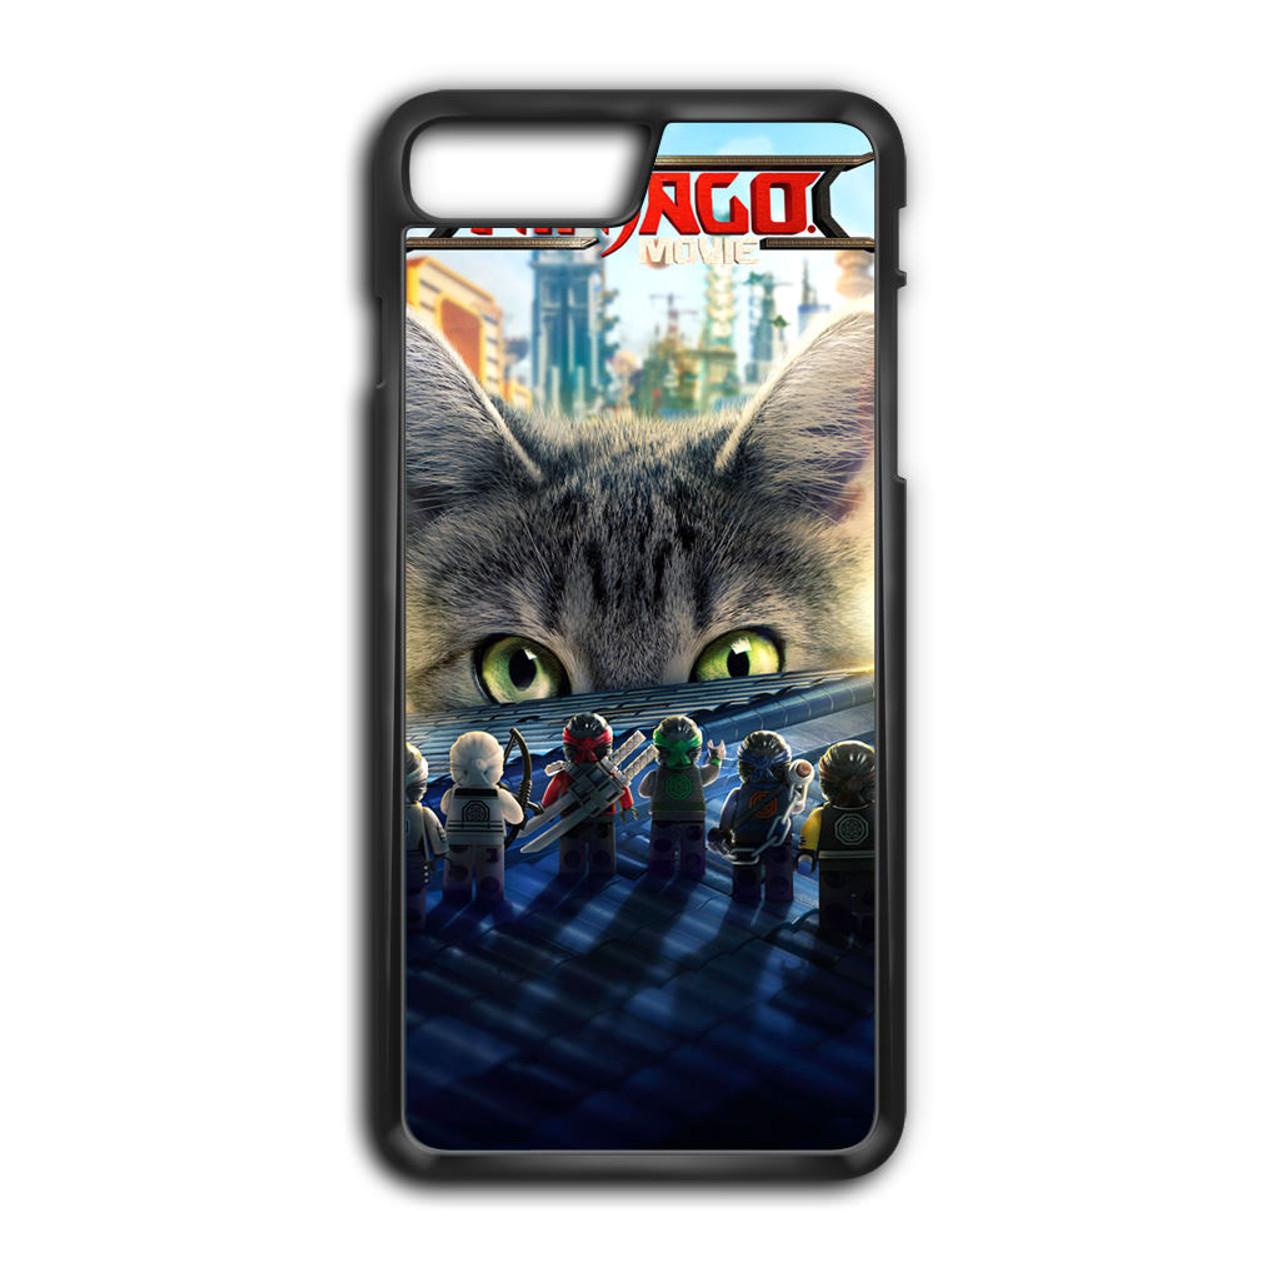 low priced 34450 0c32e The Lego Ninjago 2 iPhone 8 Plus Case